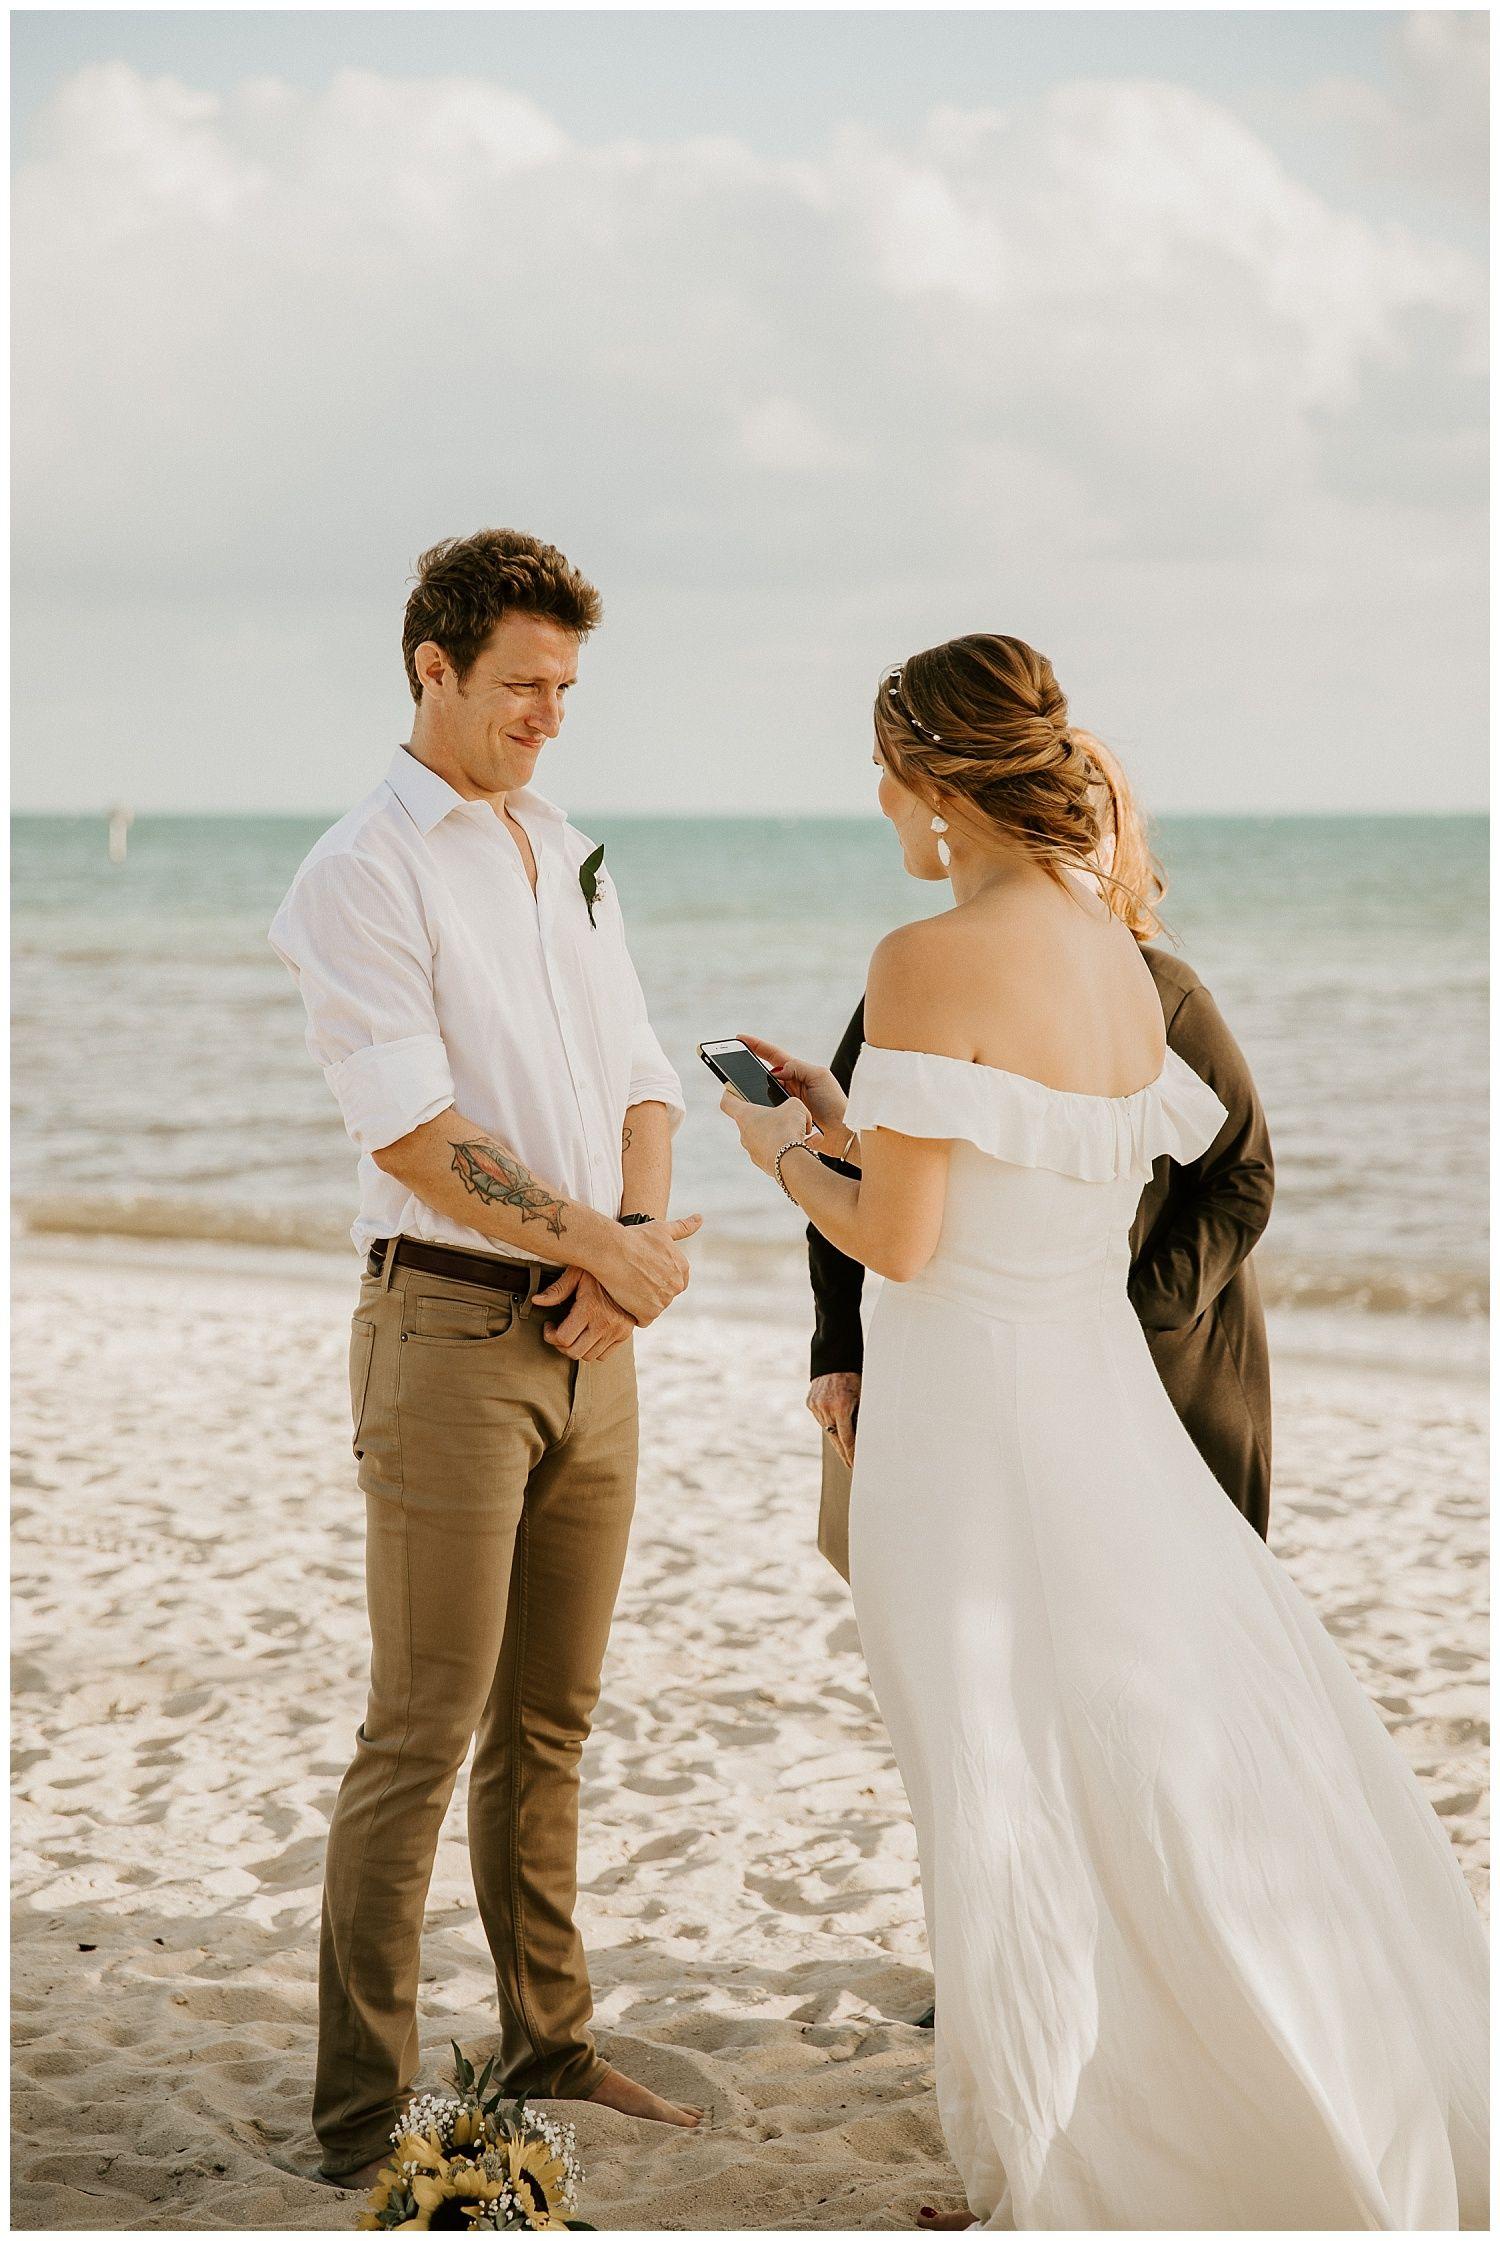 Smathers Beach Elopement Miami Wedding Photographer Beach Elopement Palm Beach Wedding